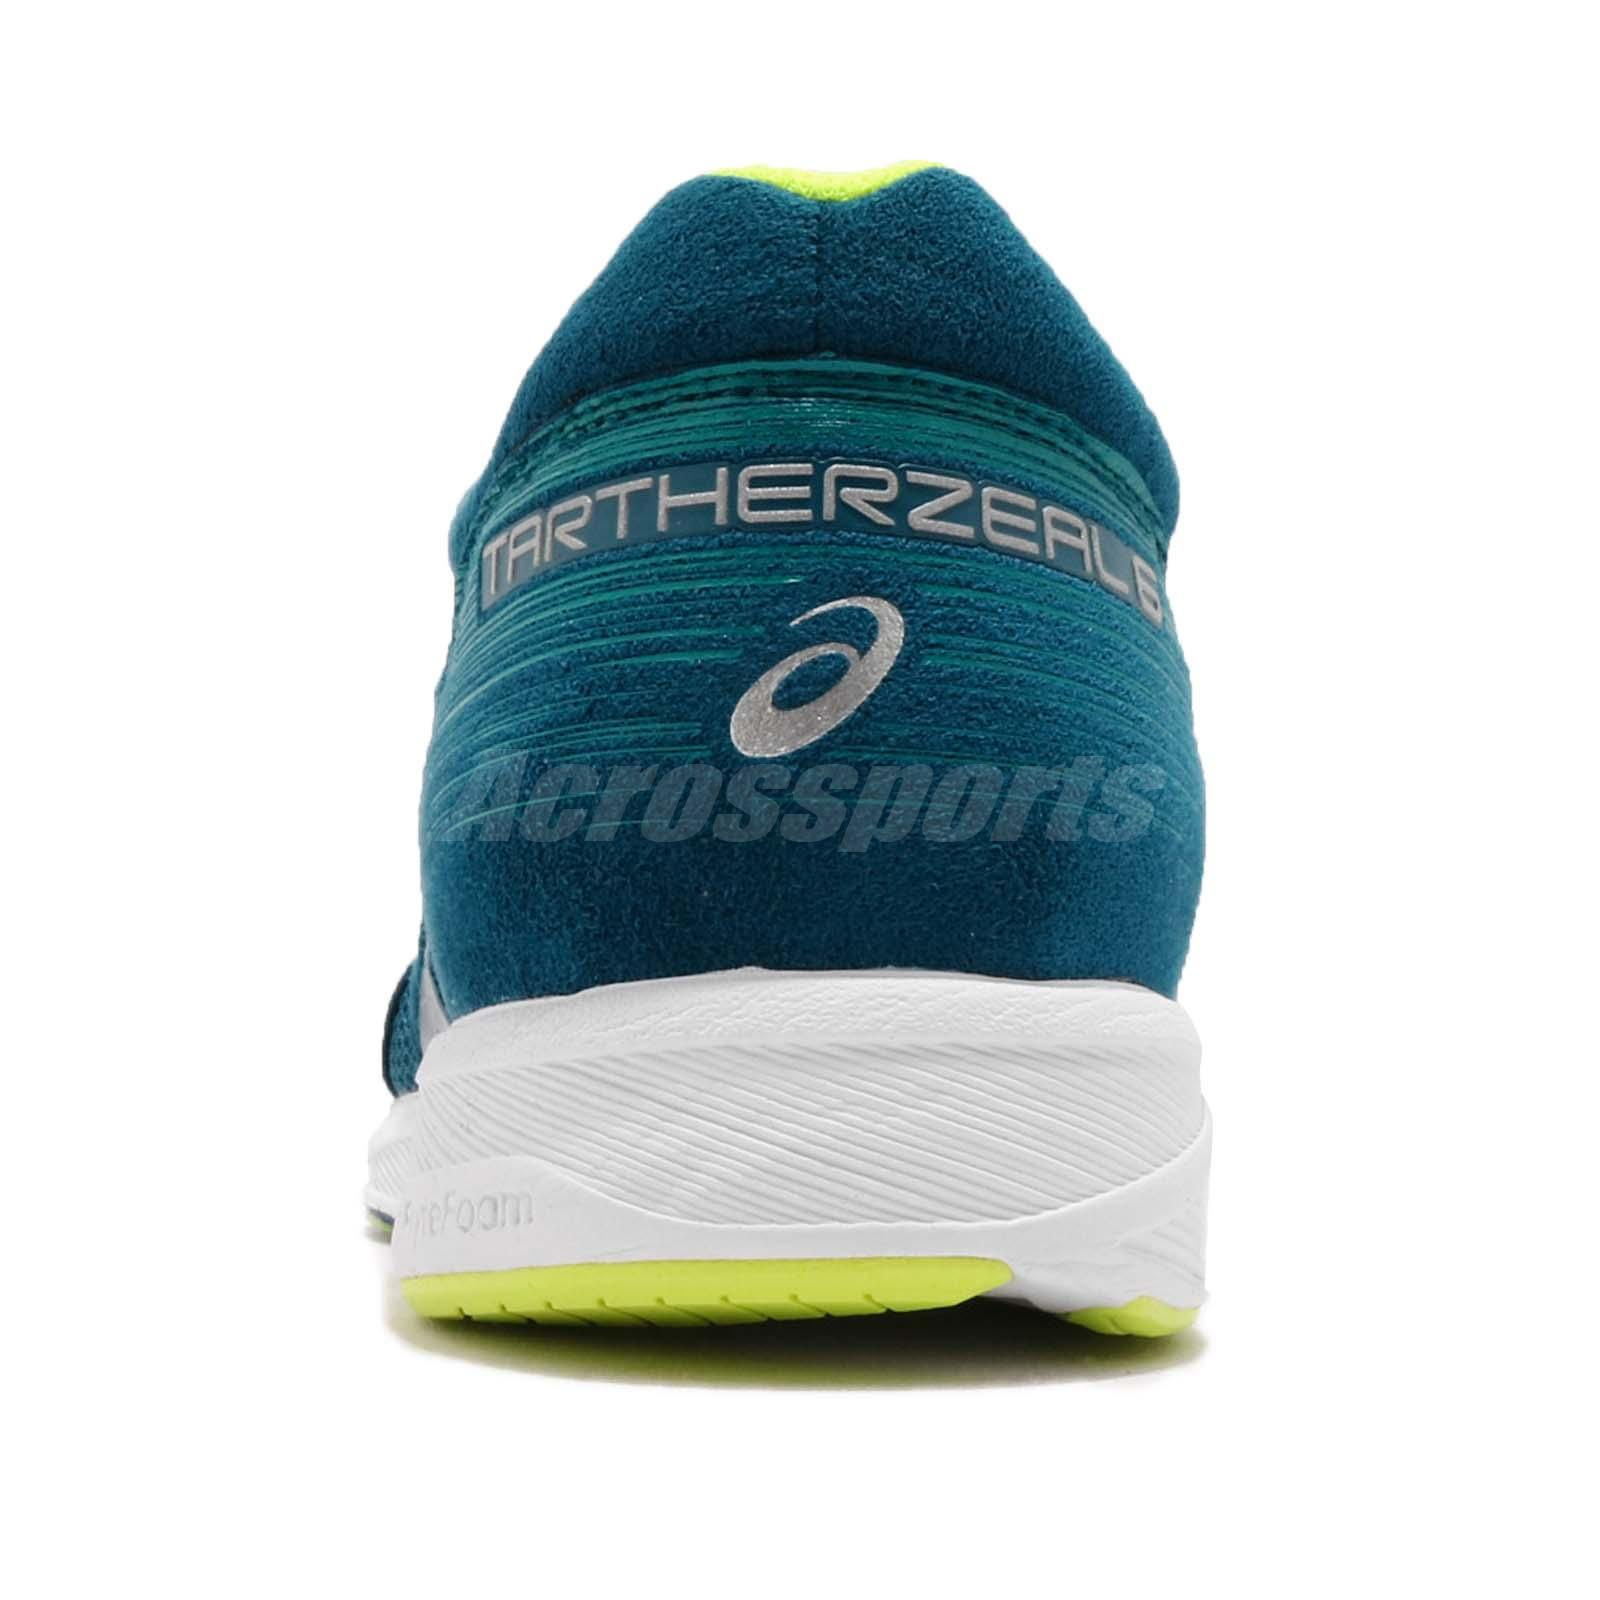 8f2bcb2cf2b4 Asics Tartherzeal 6 Wide Deep Aqua Volt White Men Running Shoes ...